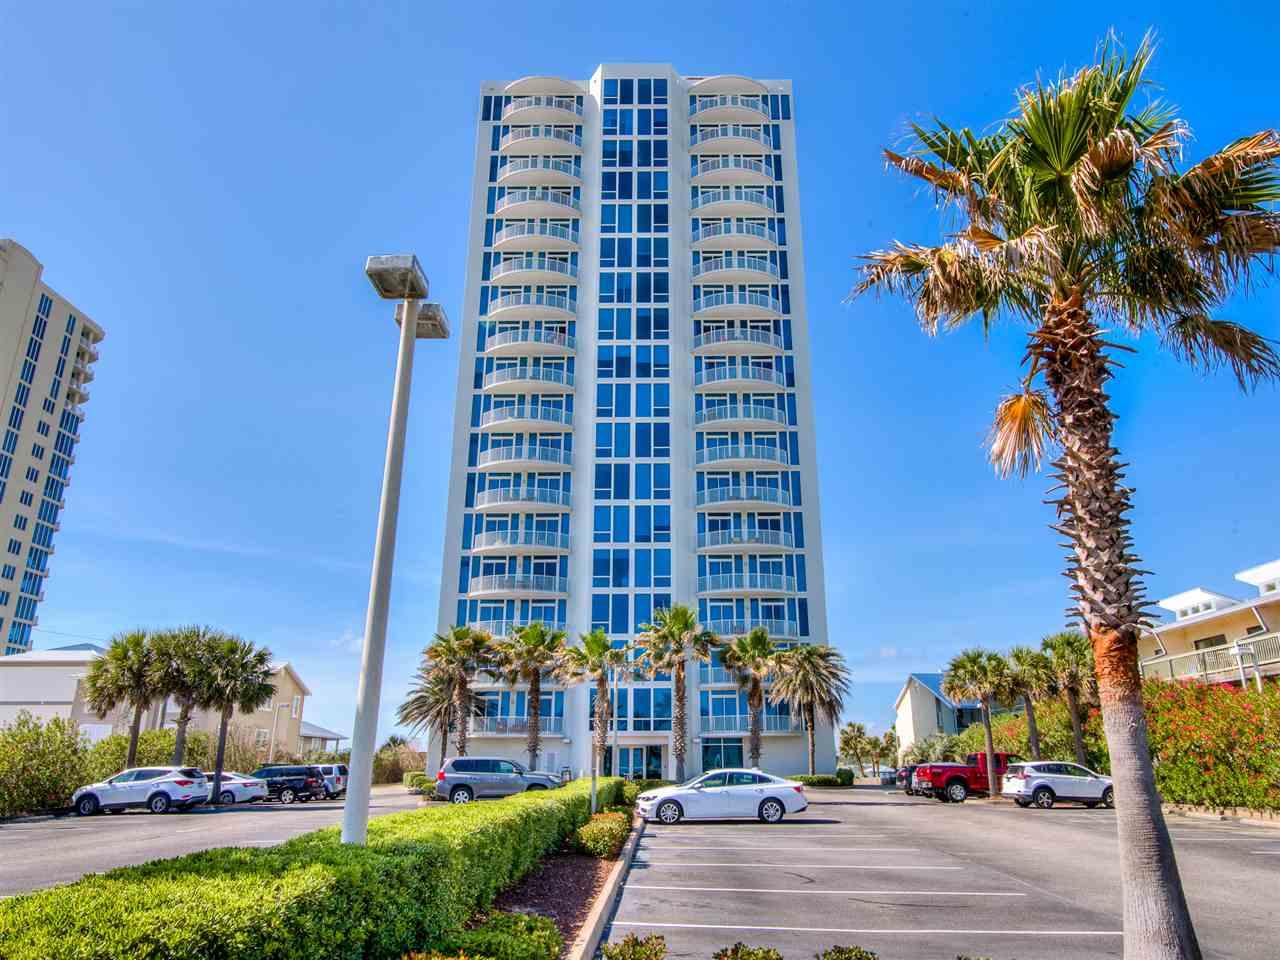 Bel Sol Condominium, Gulf Shores Alabama Real Estate Sales